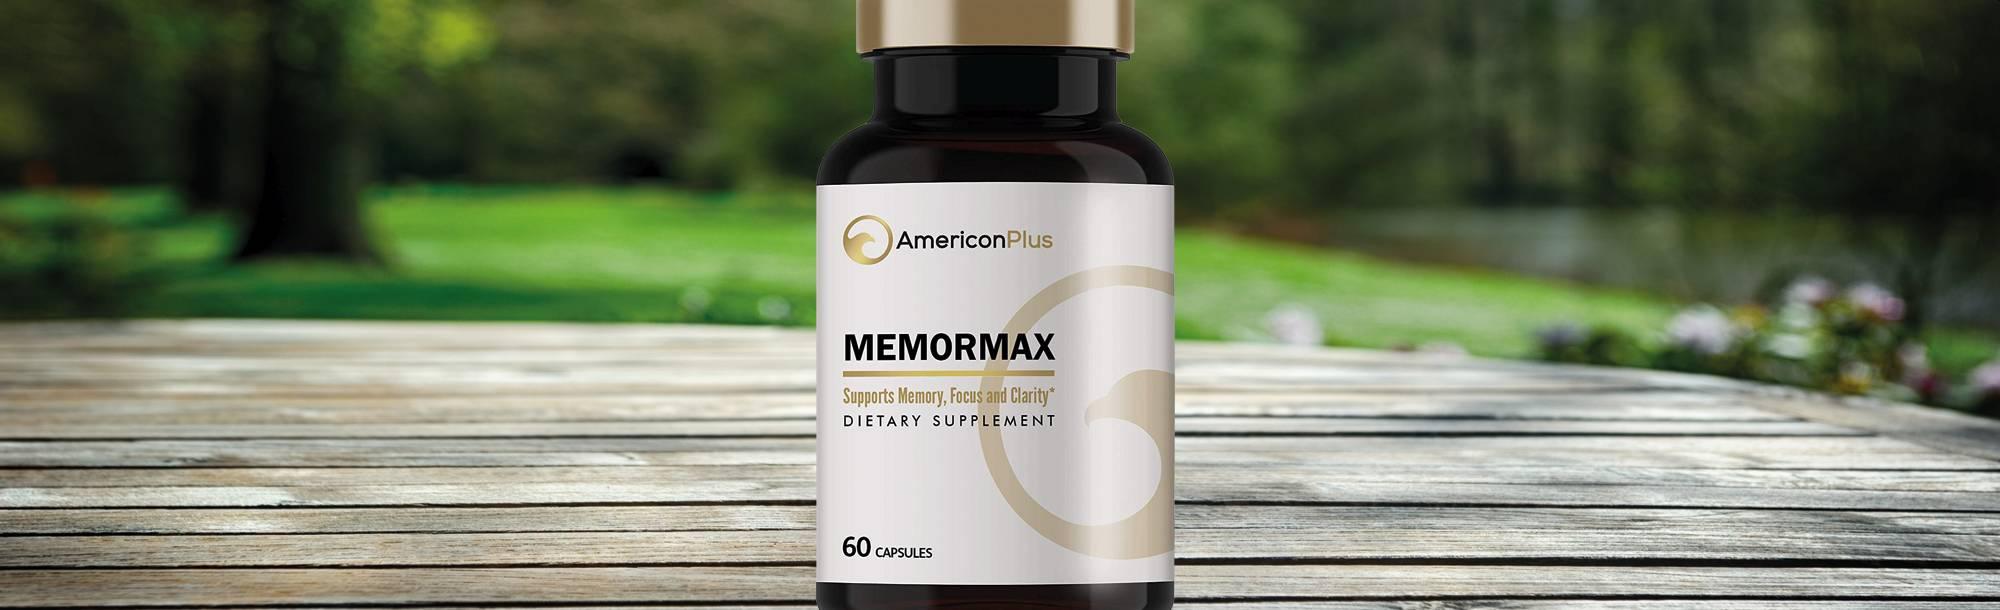 Americon Plus Memormax Review